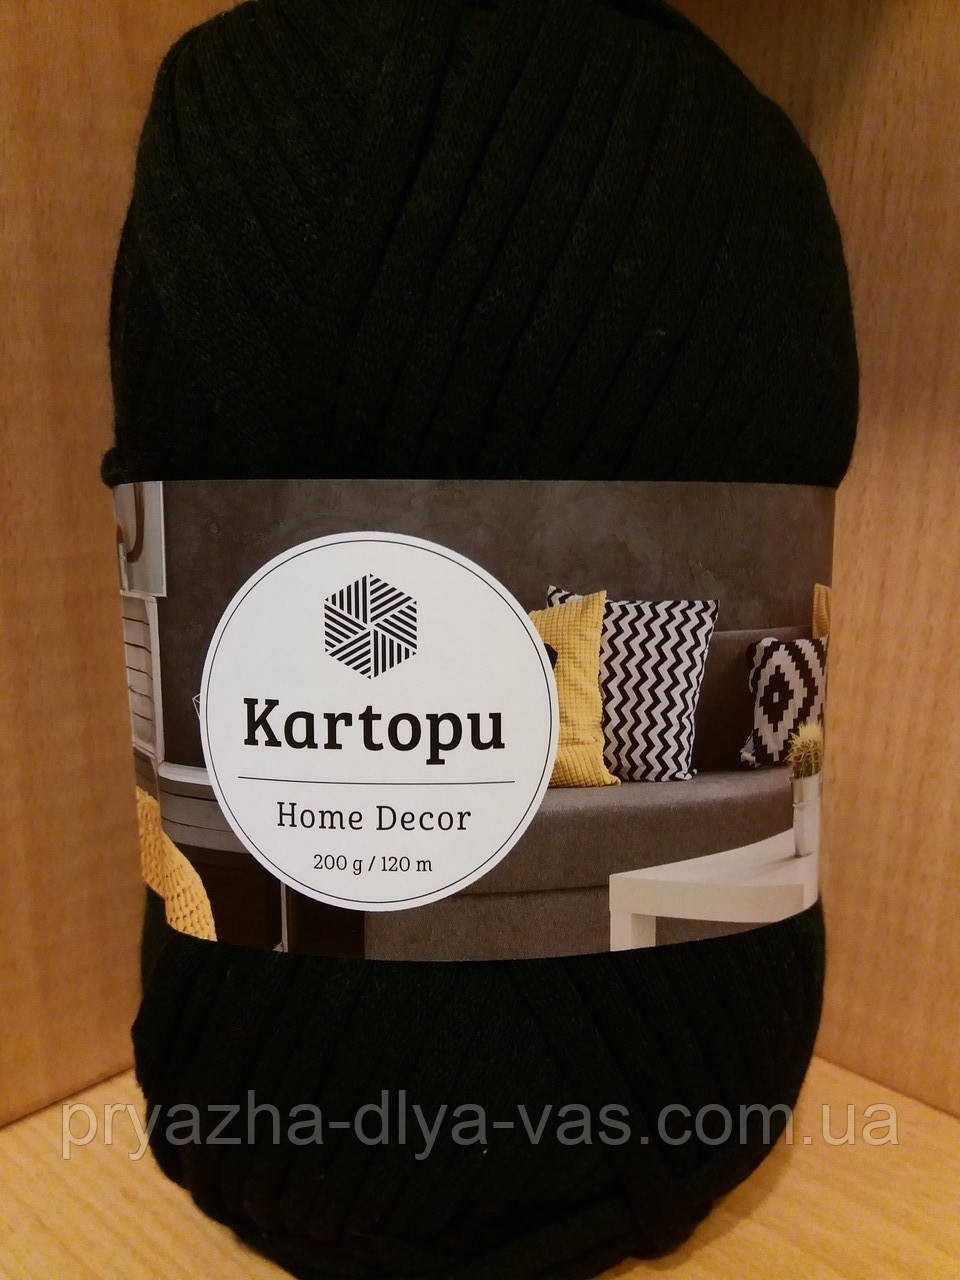 Фантазийная пряжа(70%-хлопок,30%-полиамид; 200г/120м) Kartopu Home Decor K940(чёрный)